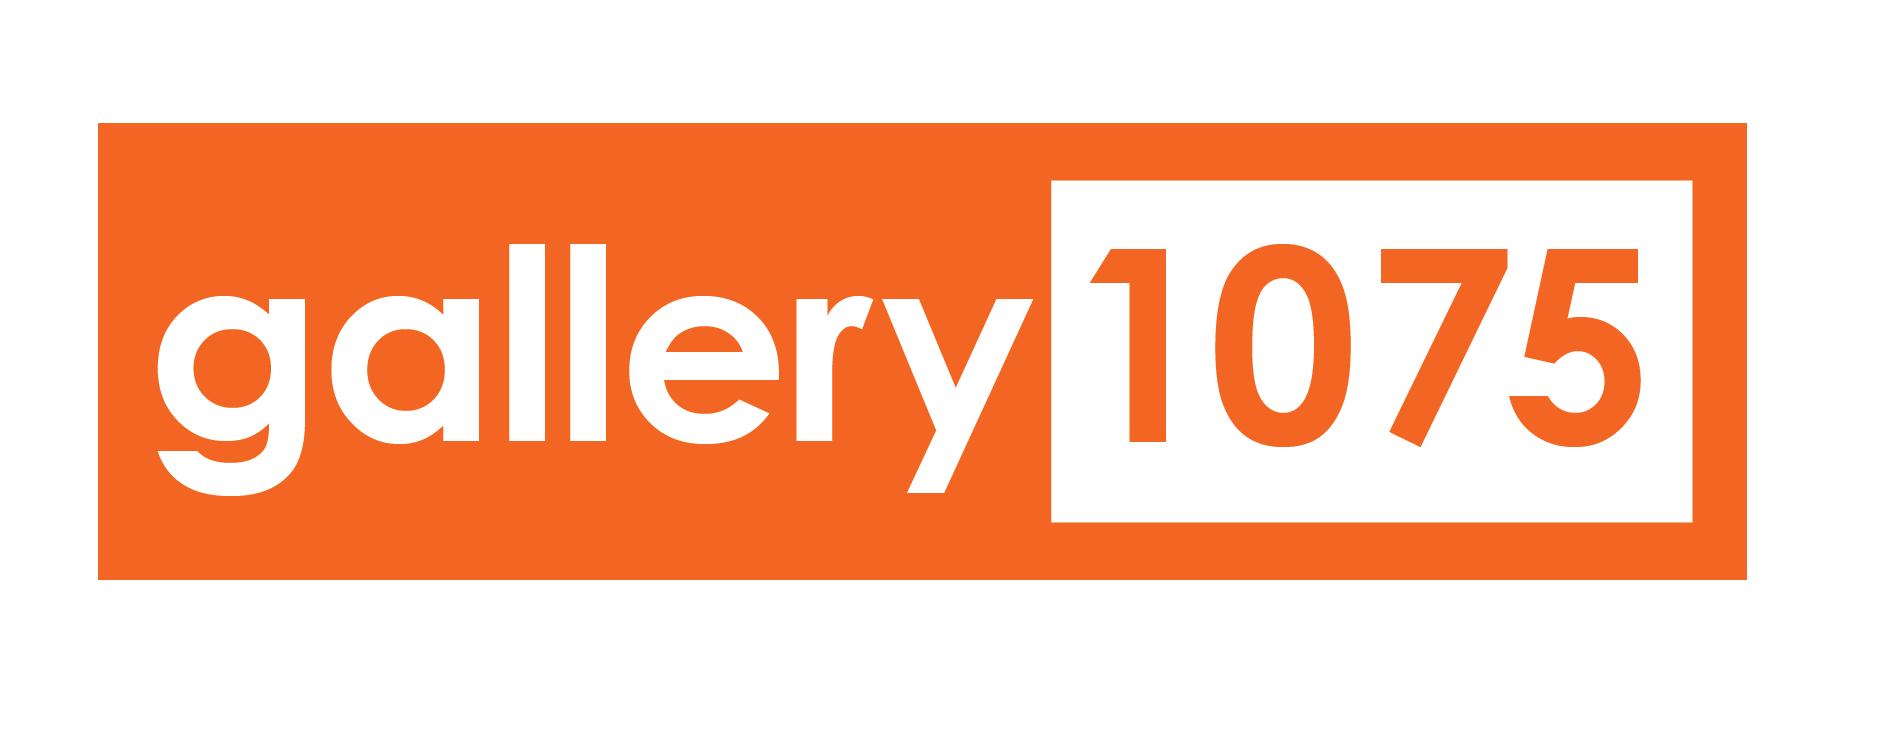 Gallery1075_logo-01